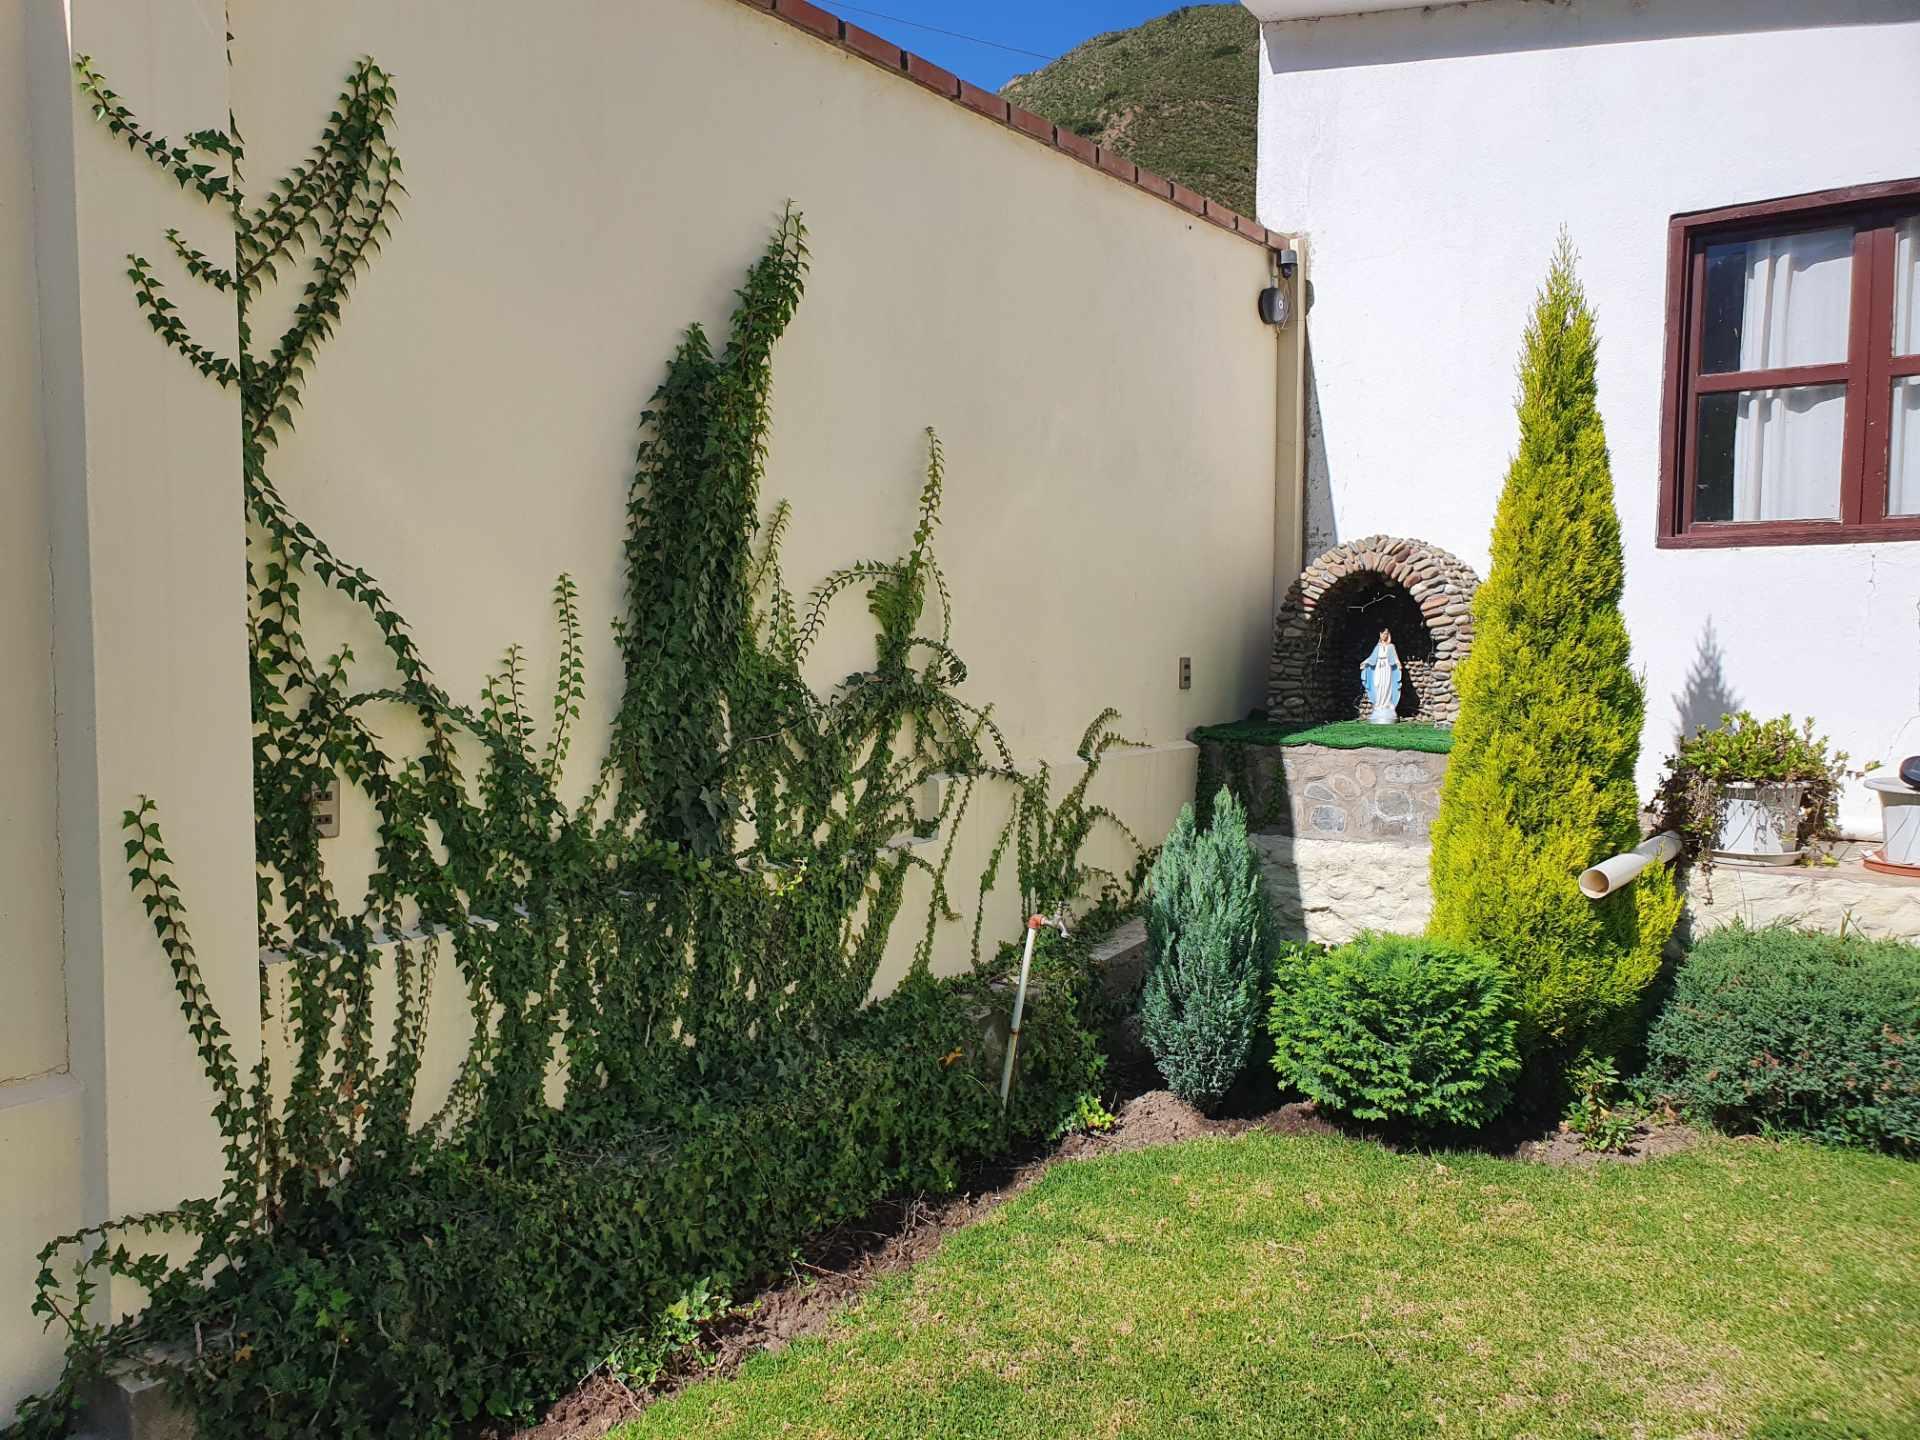 Casa en Venta Zona Sur, Huajchilla. Urbanizacion Bartos. Foto 5